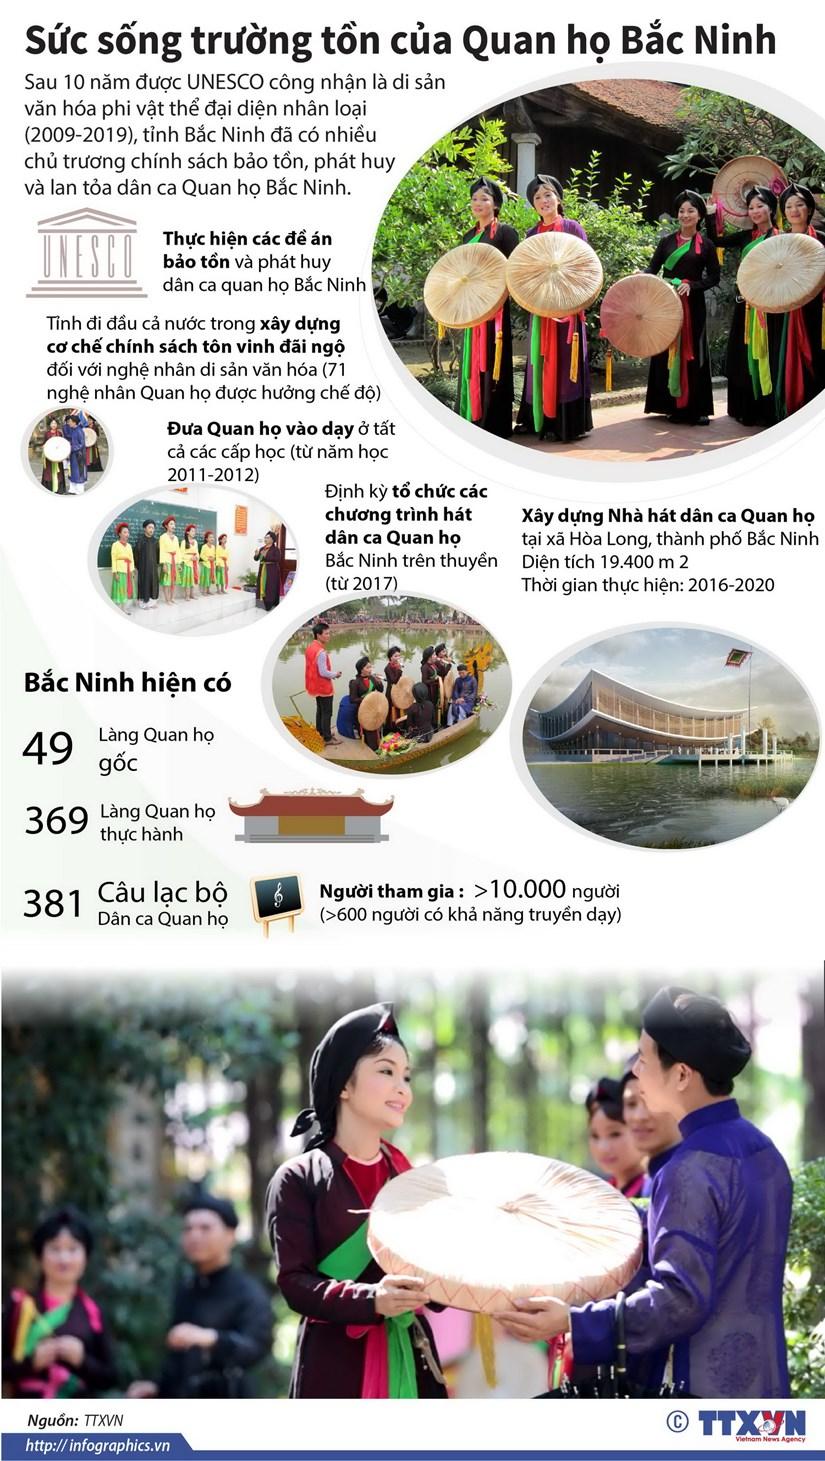 [Infographics] Suc song truong ton cua Quan ho Bac Ninh hinh anh 1